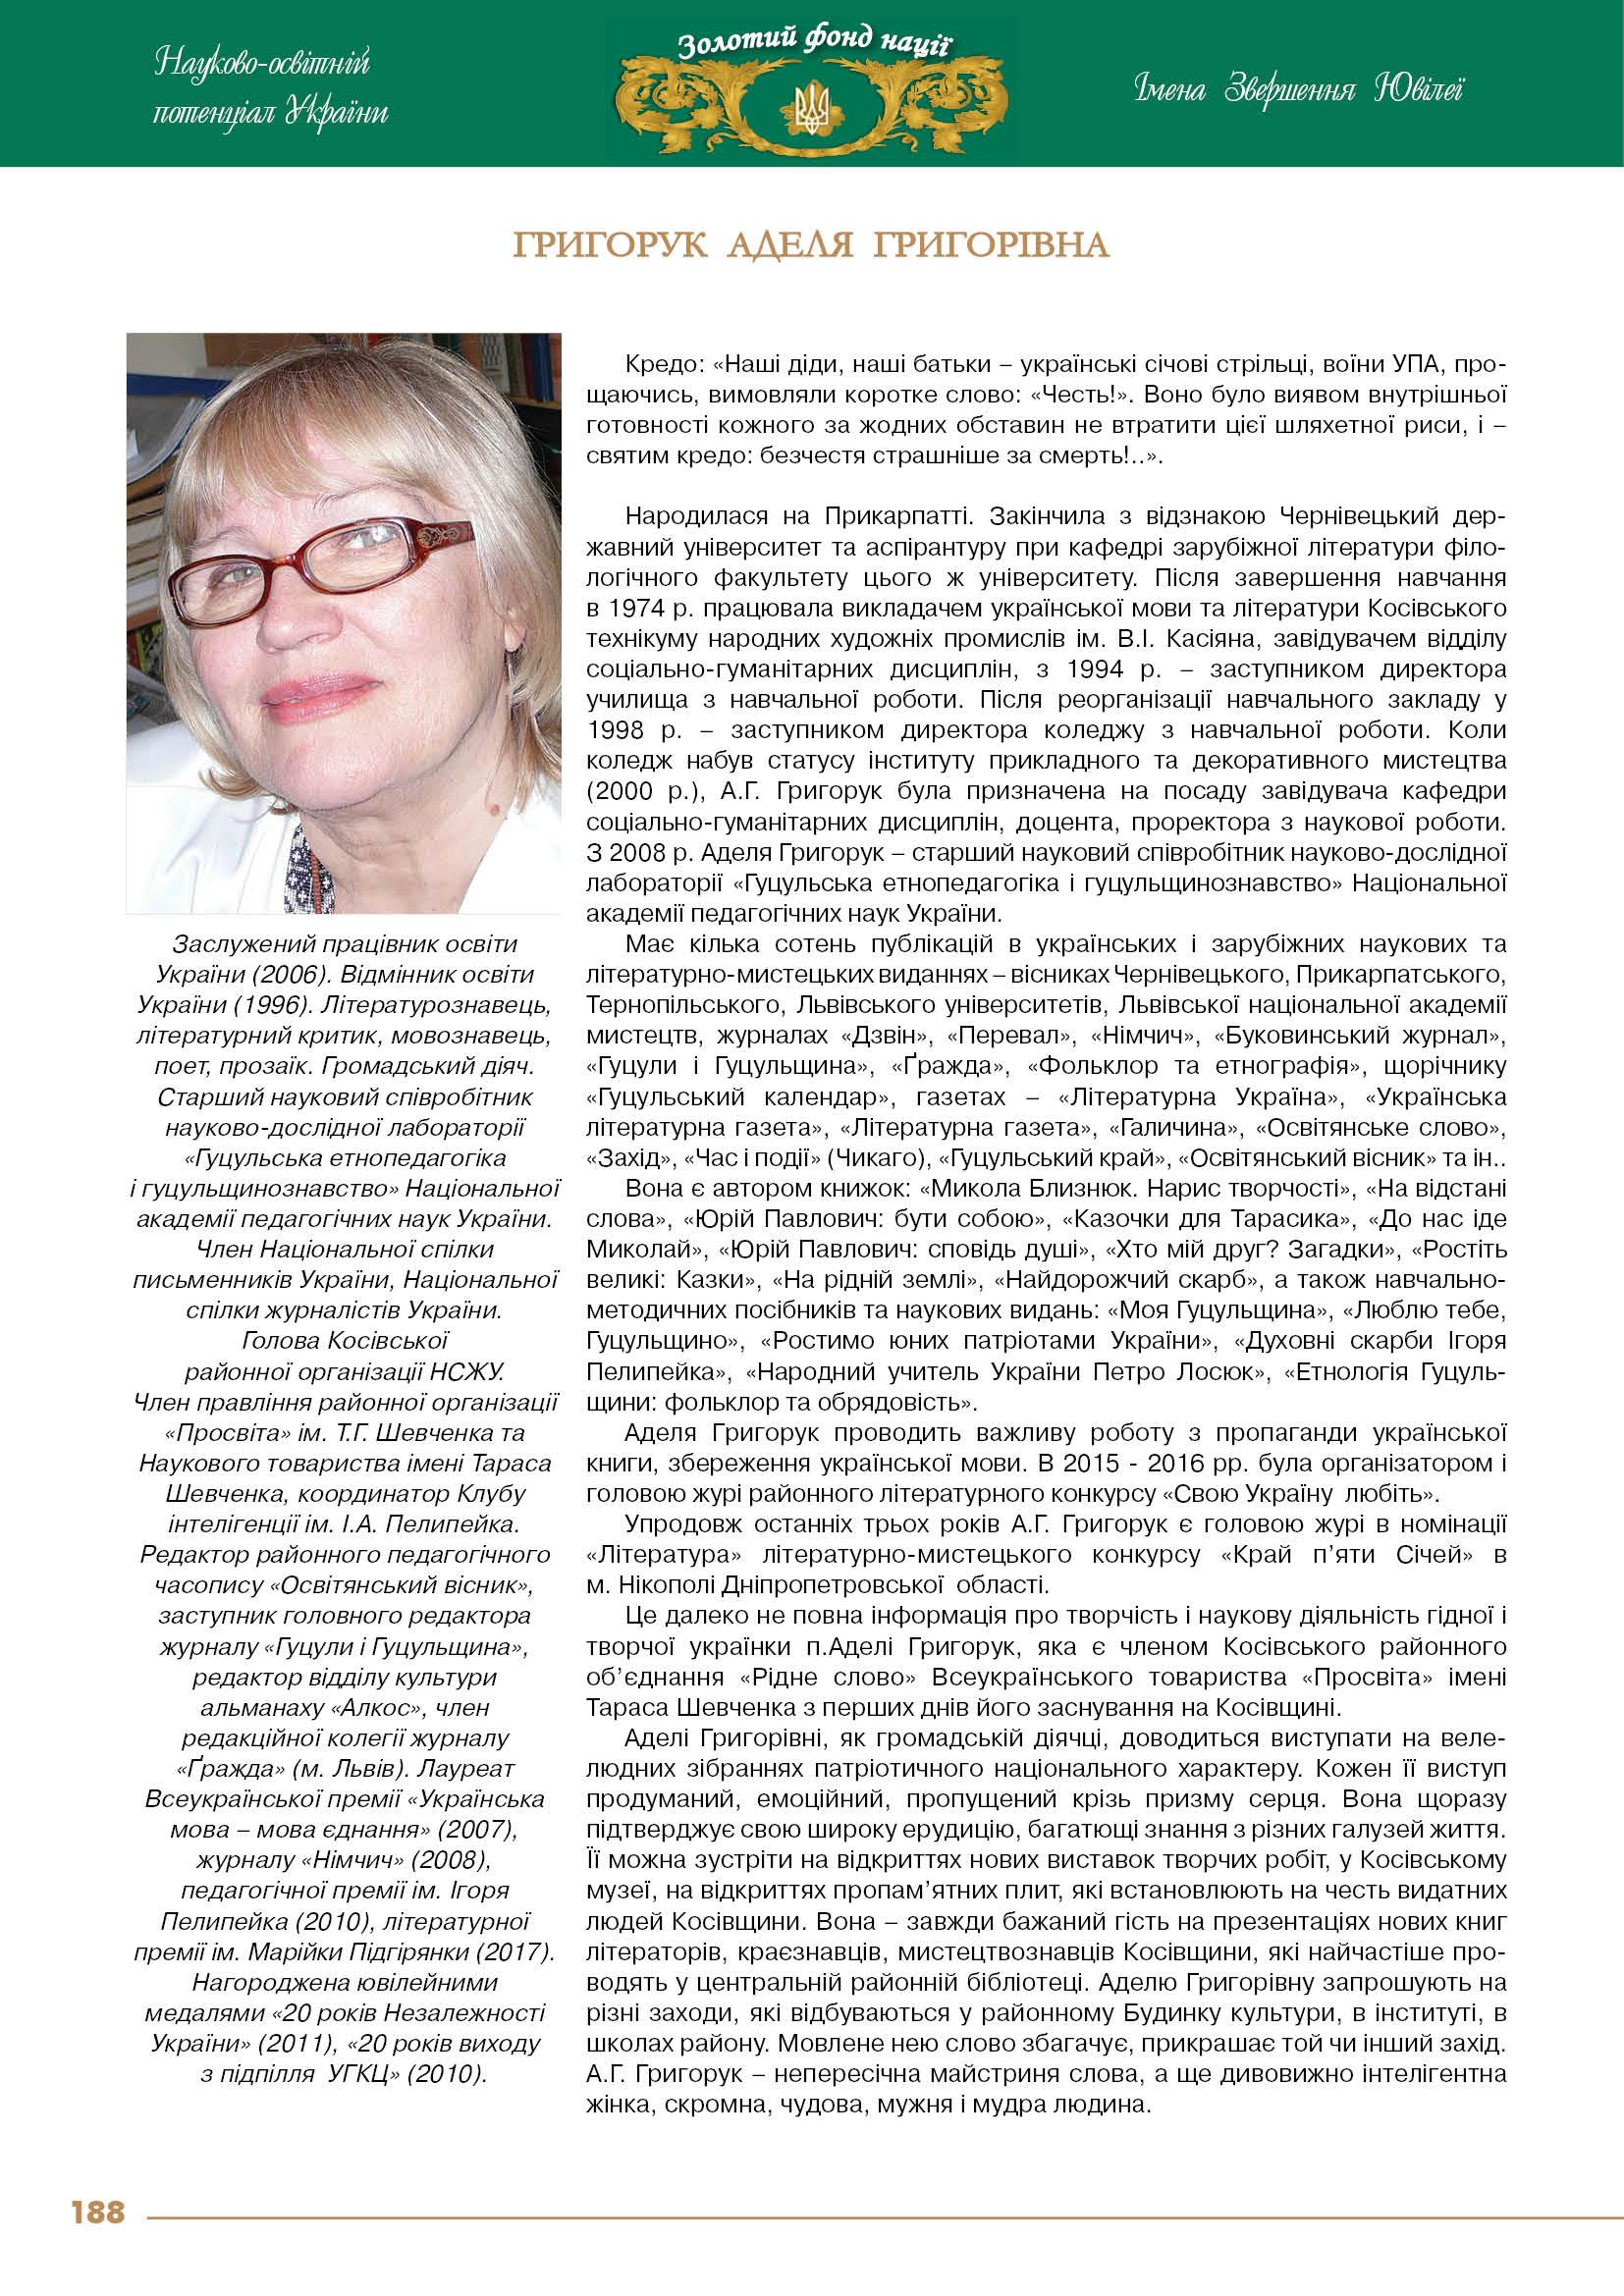 Григорук Аделя Григорівна